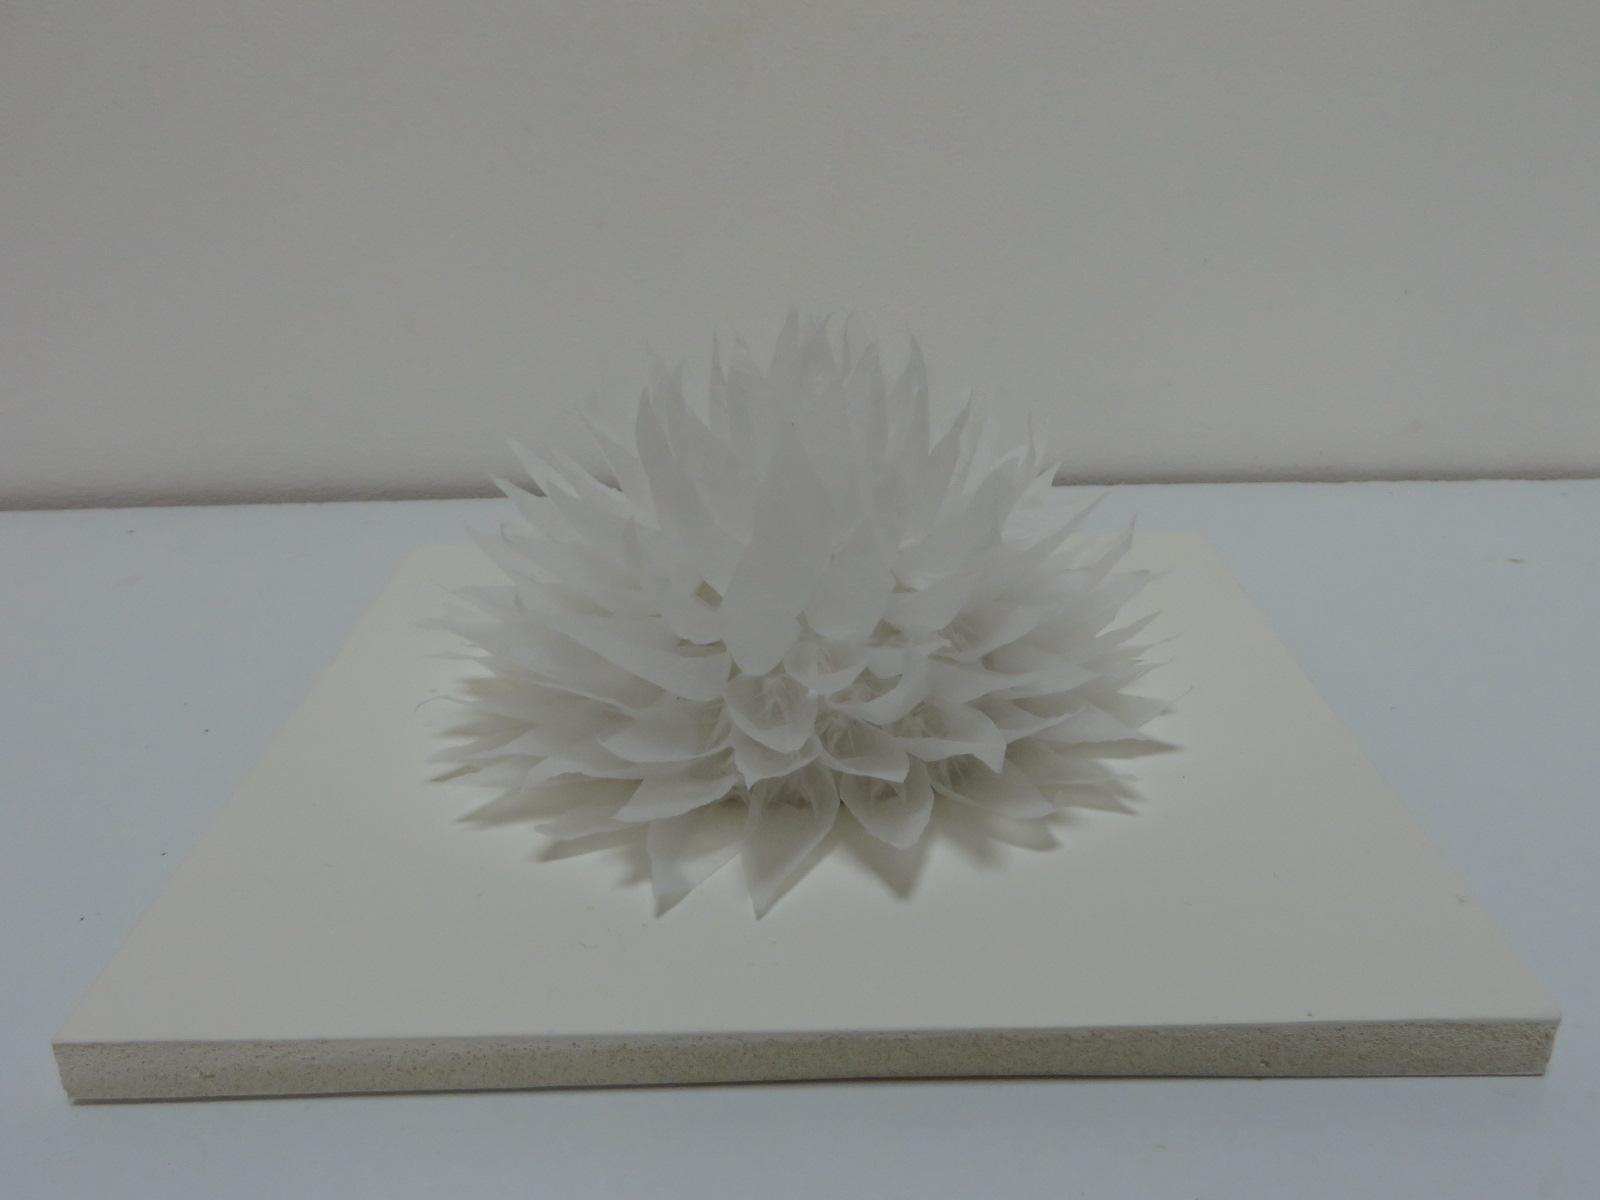 lotus-20-x-20-x-10-cm-copie